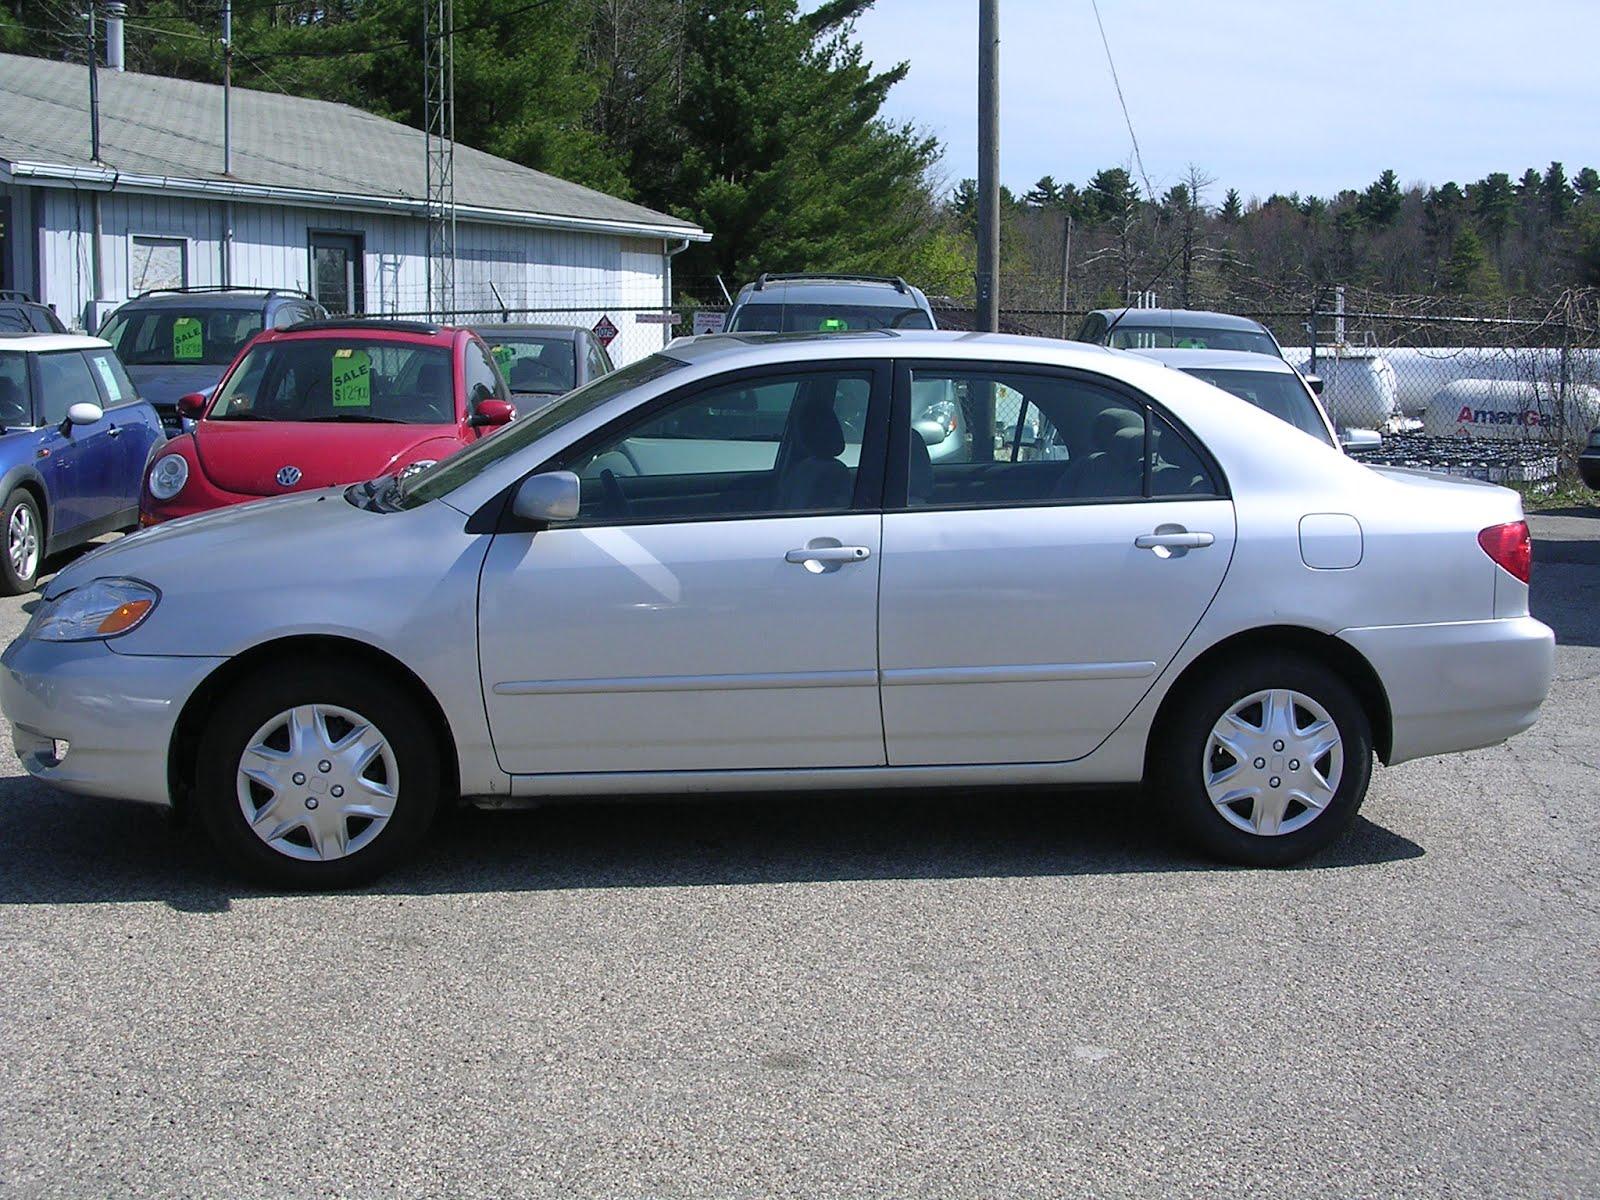 Earthy Cars Blog: April 2012